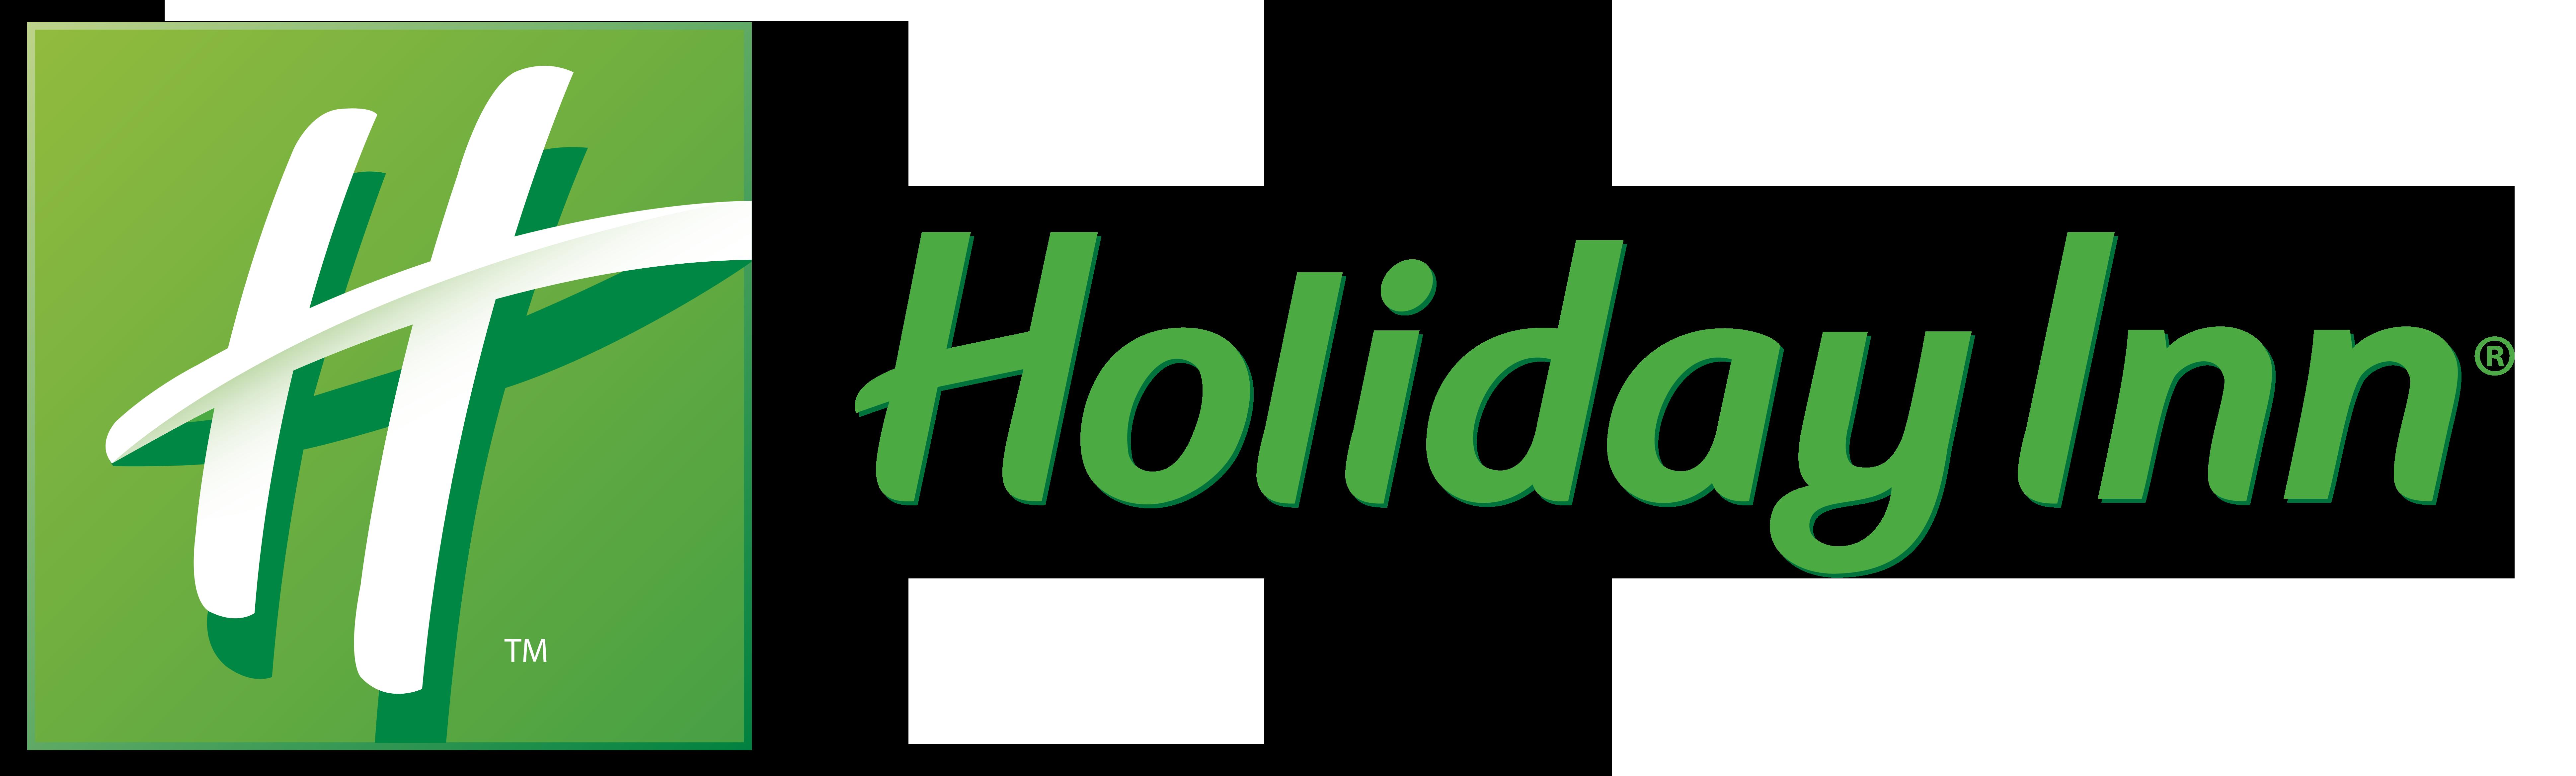 Holiday Inn – Logos Download